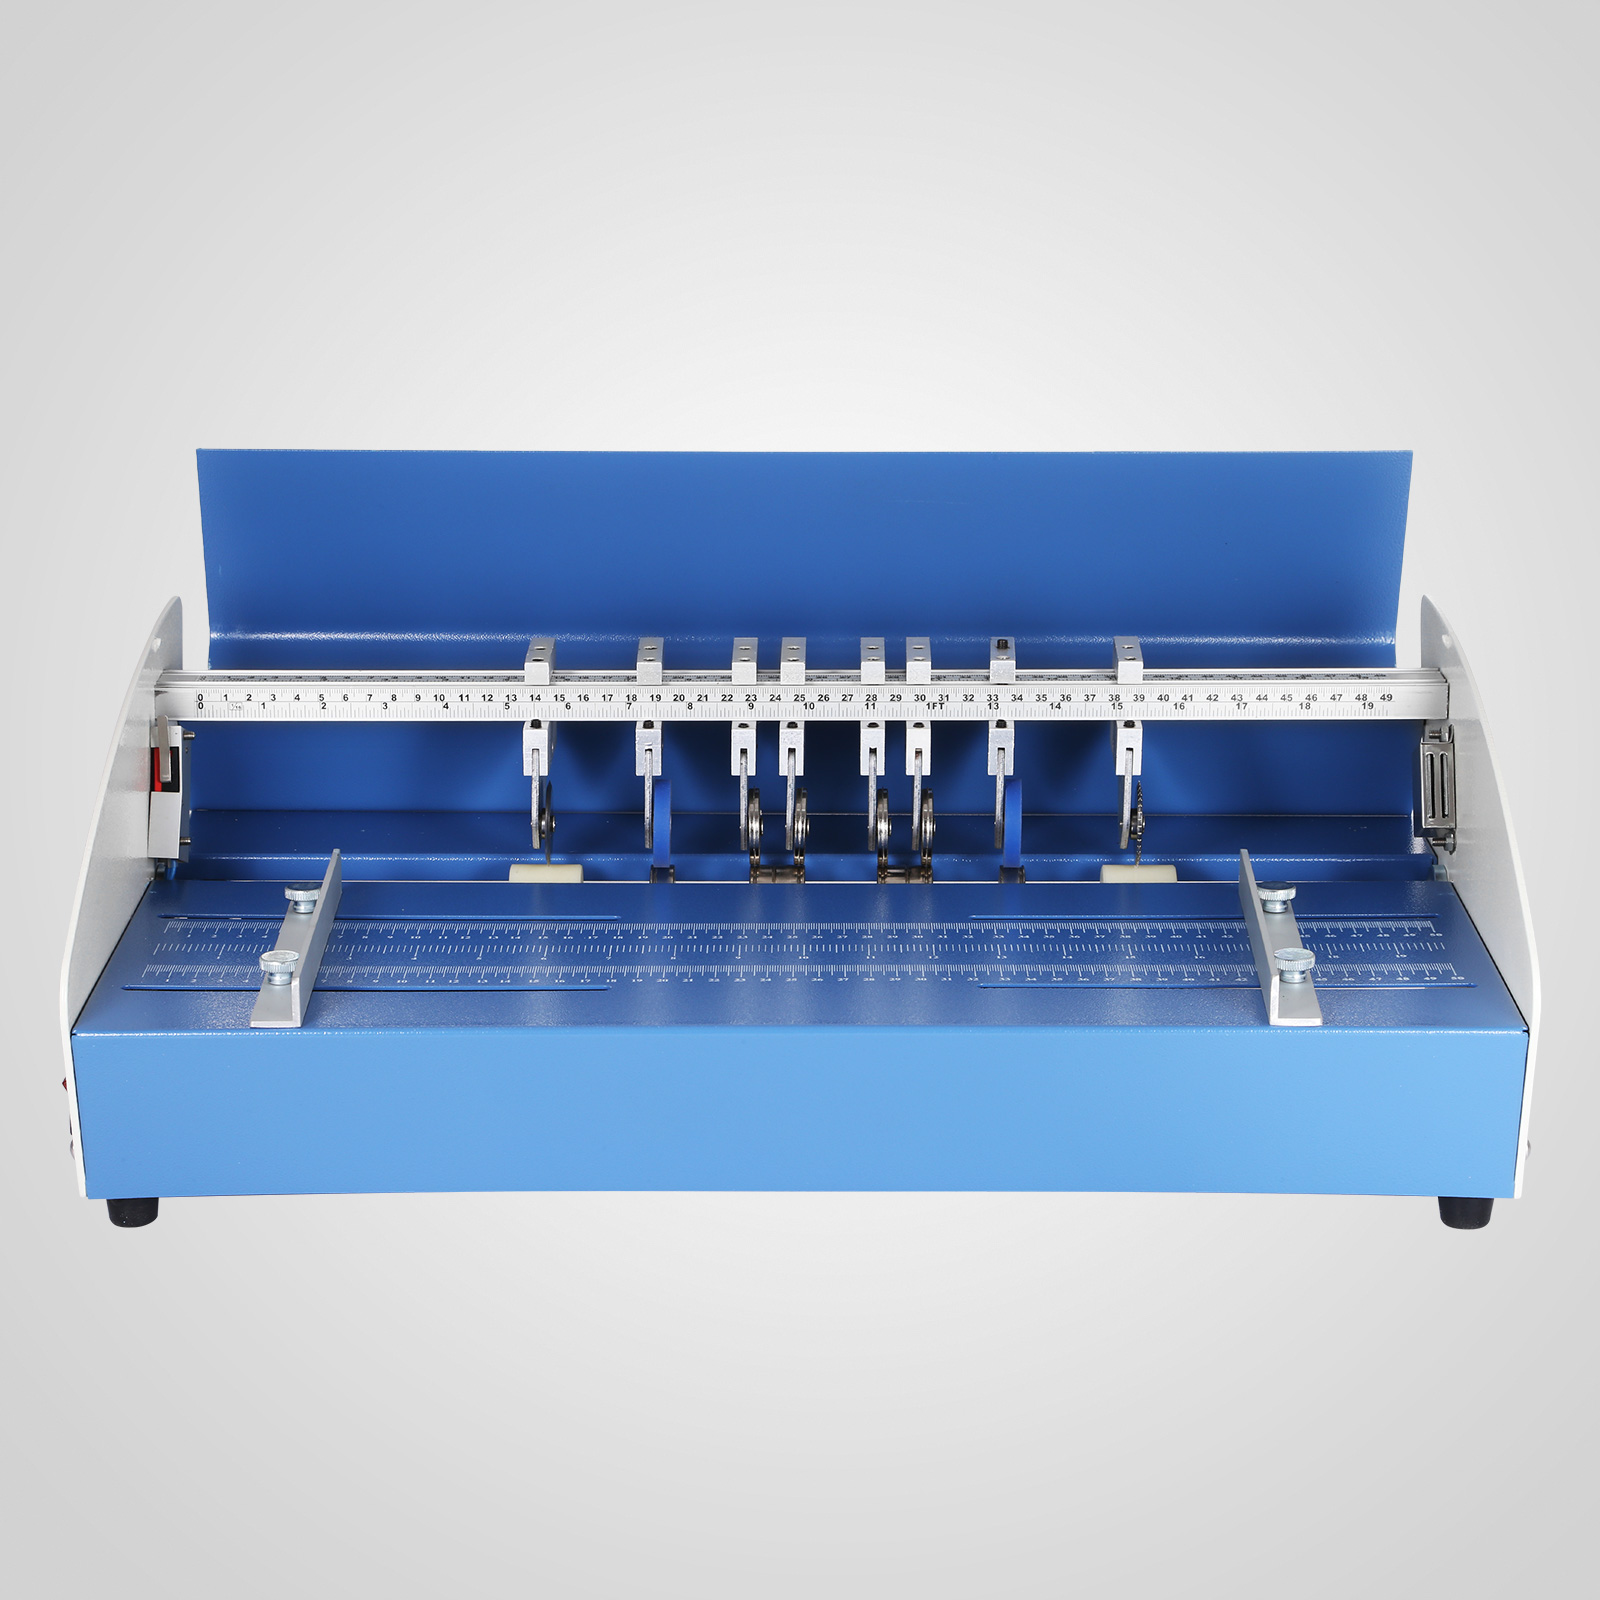 Cordonatrice-Perforatrice-Max-350-520mm-Profondita-Regolabile-Elettrica-Manuale miniatura 17